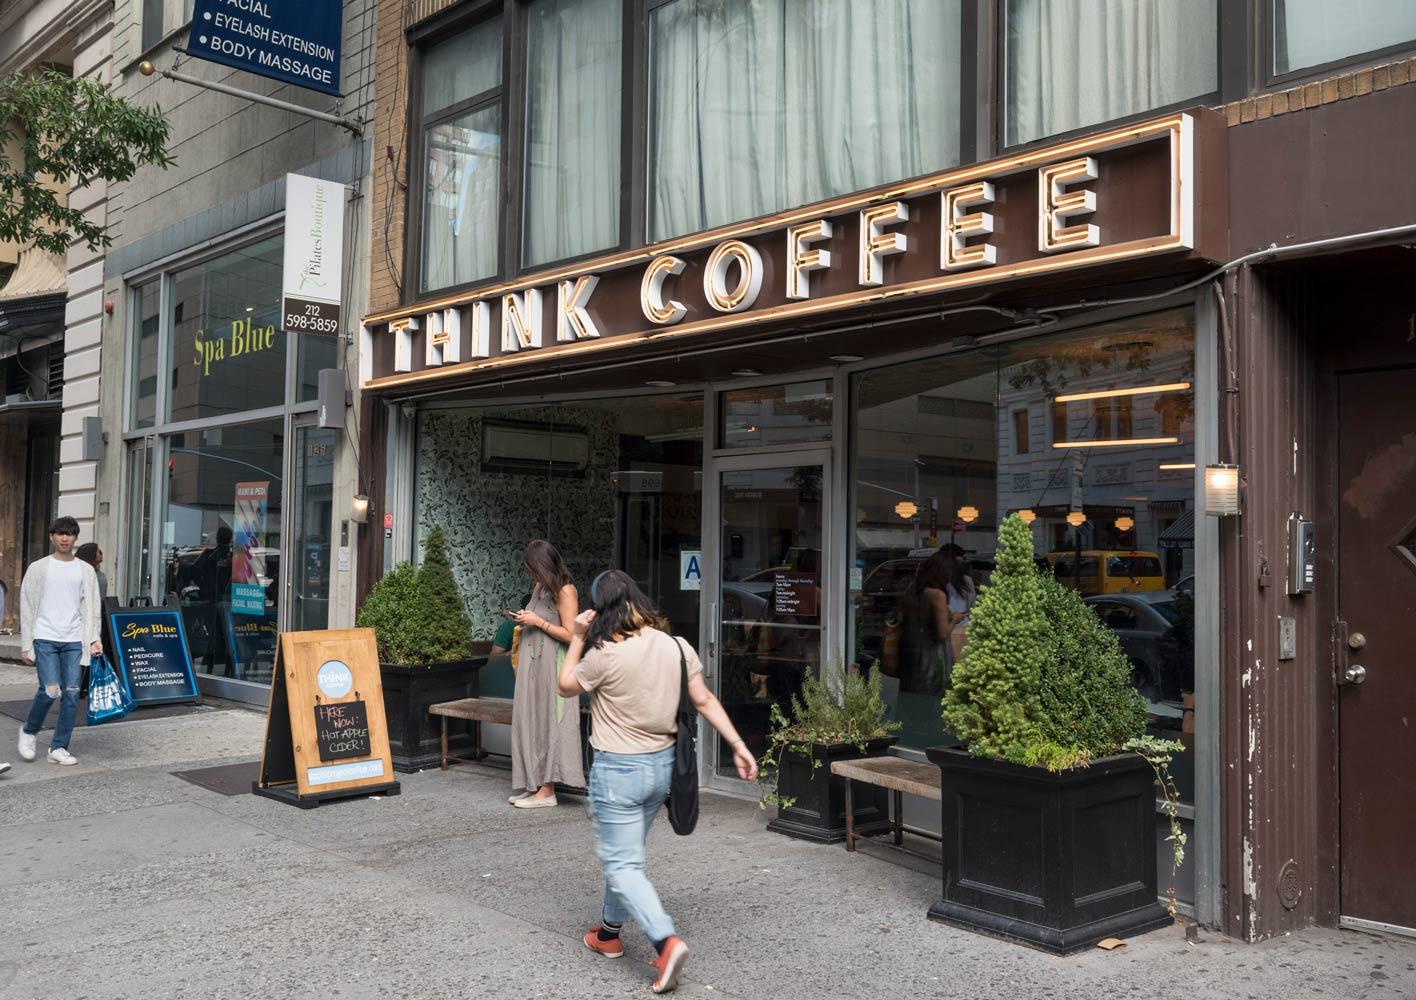 20170909_thinkcoffee_4th_ave_5.jpg